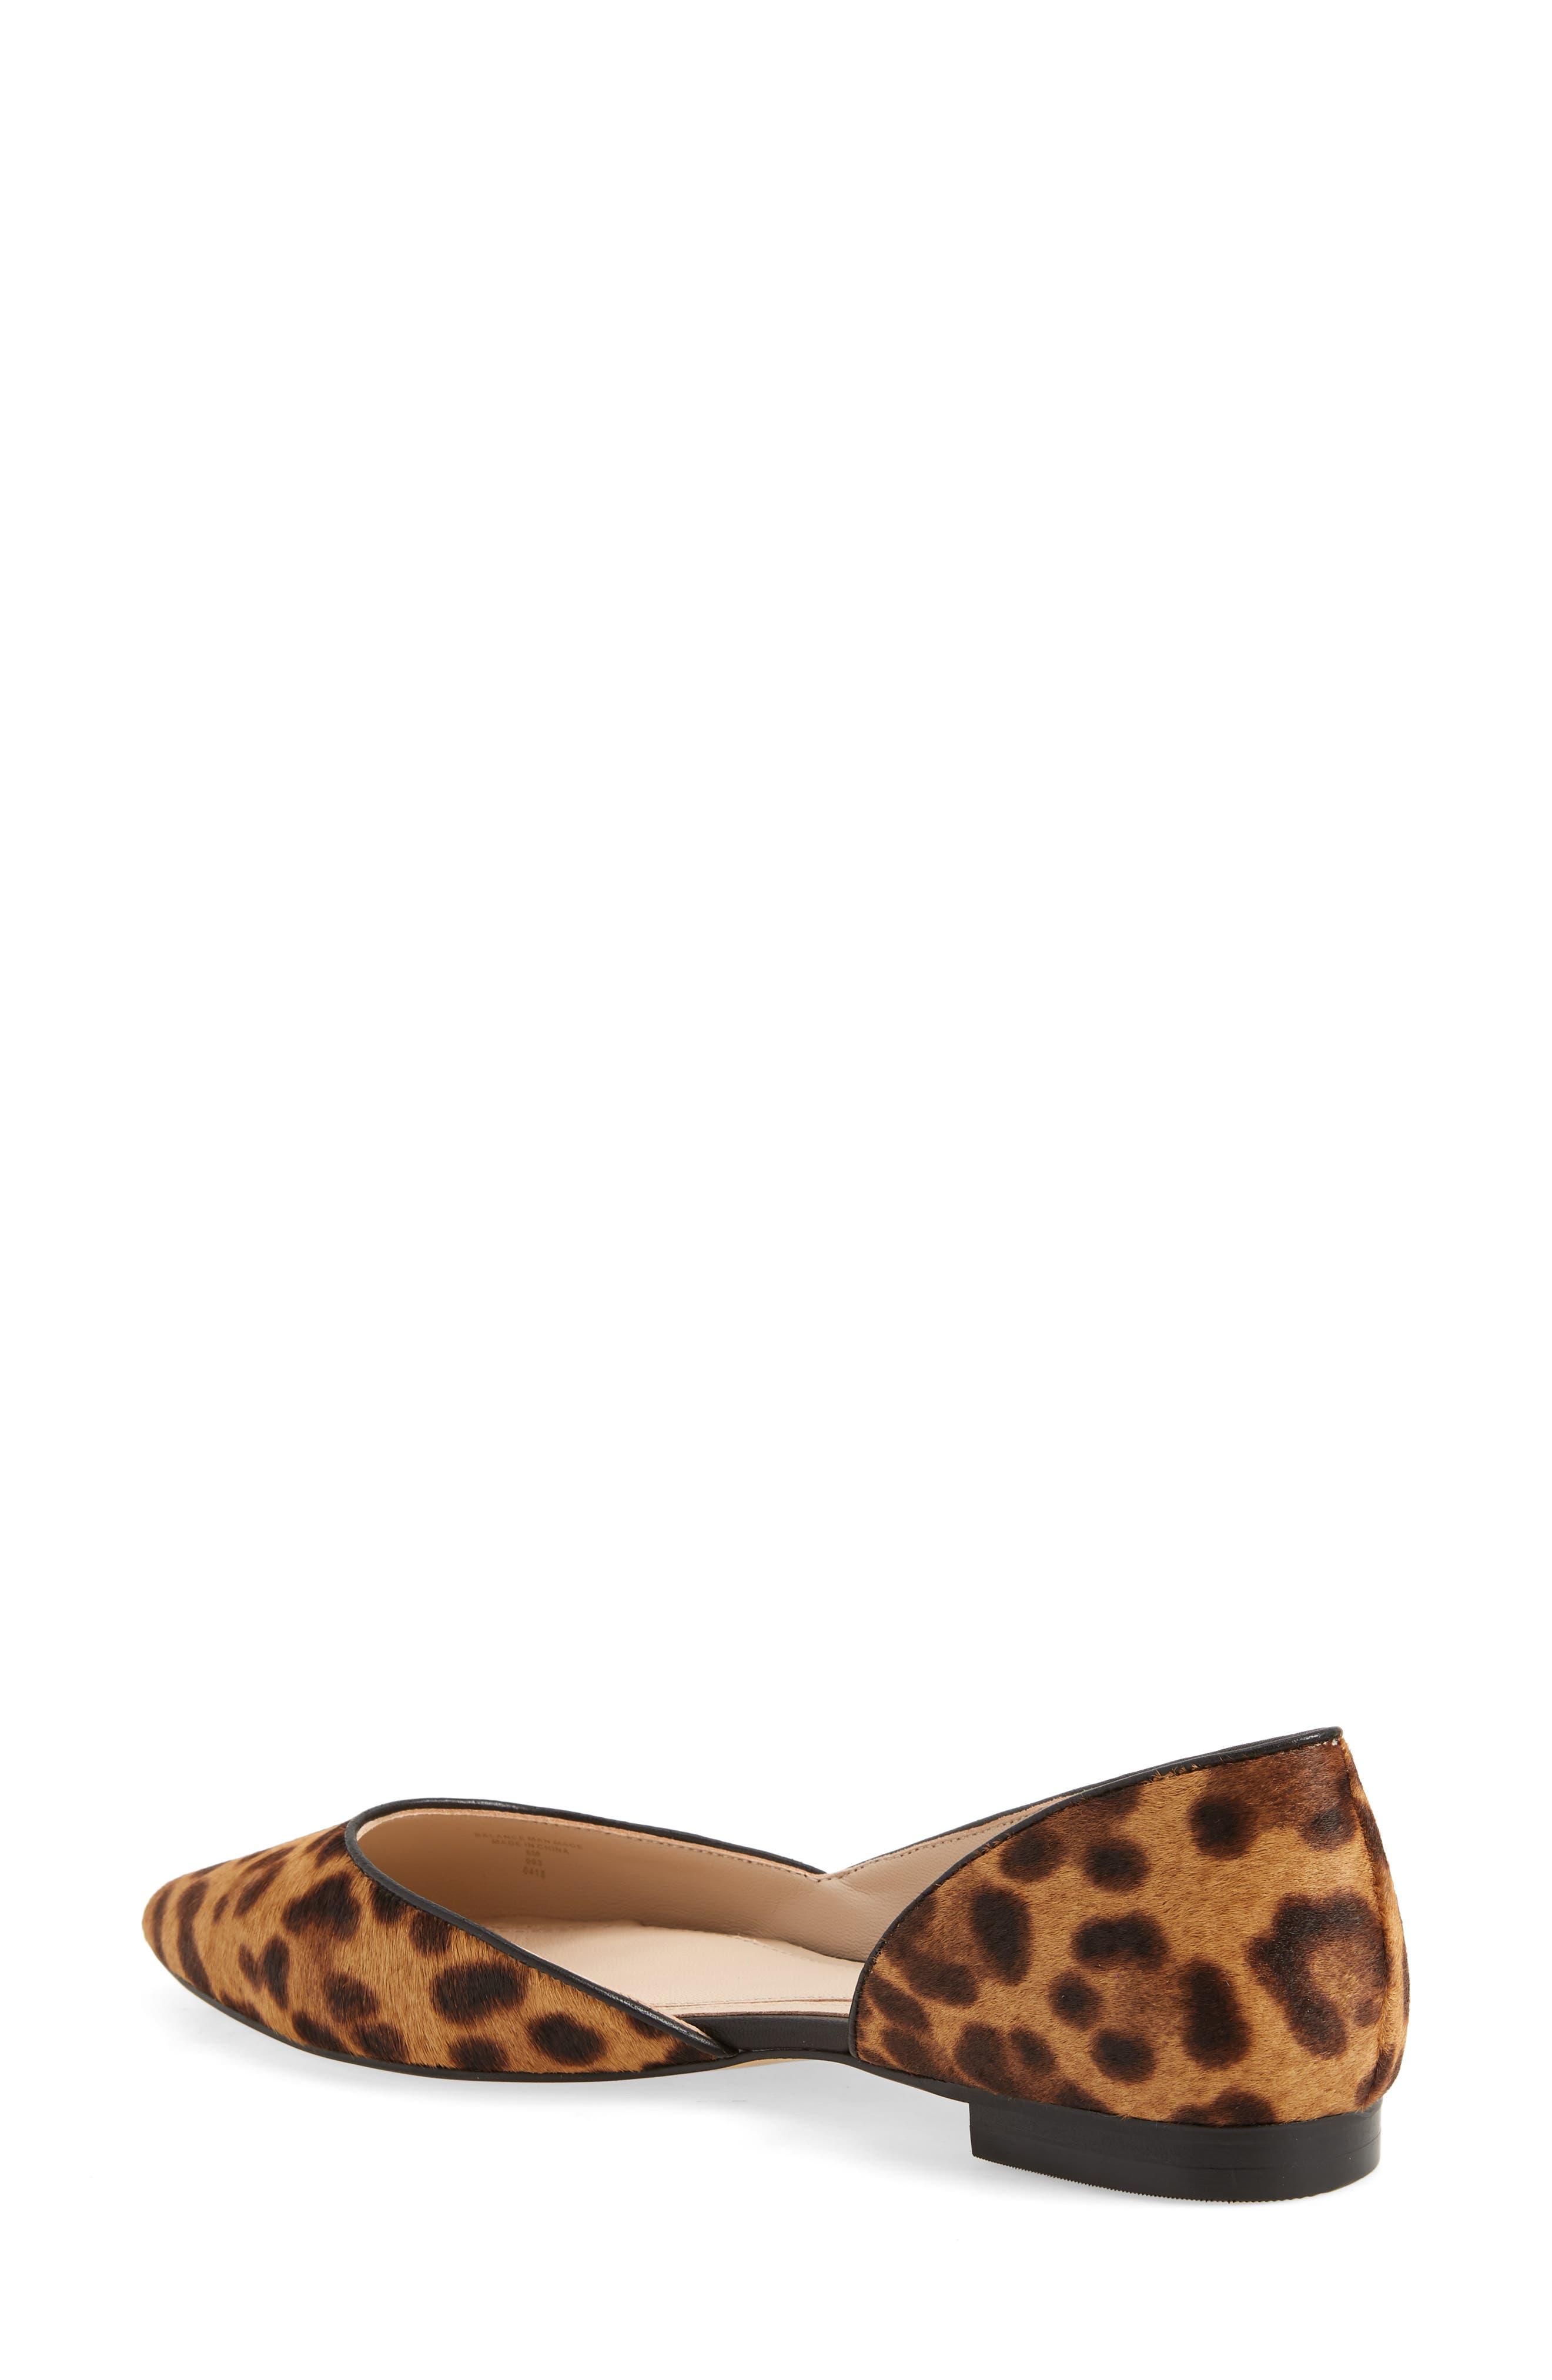 Sunny Genuine Calf Hair Flat,                             Alternate thumbnail 2, color,                             Leopard Calf Hair